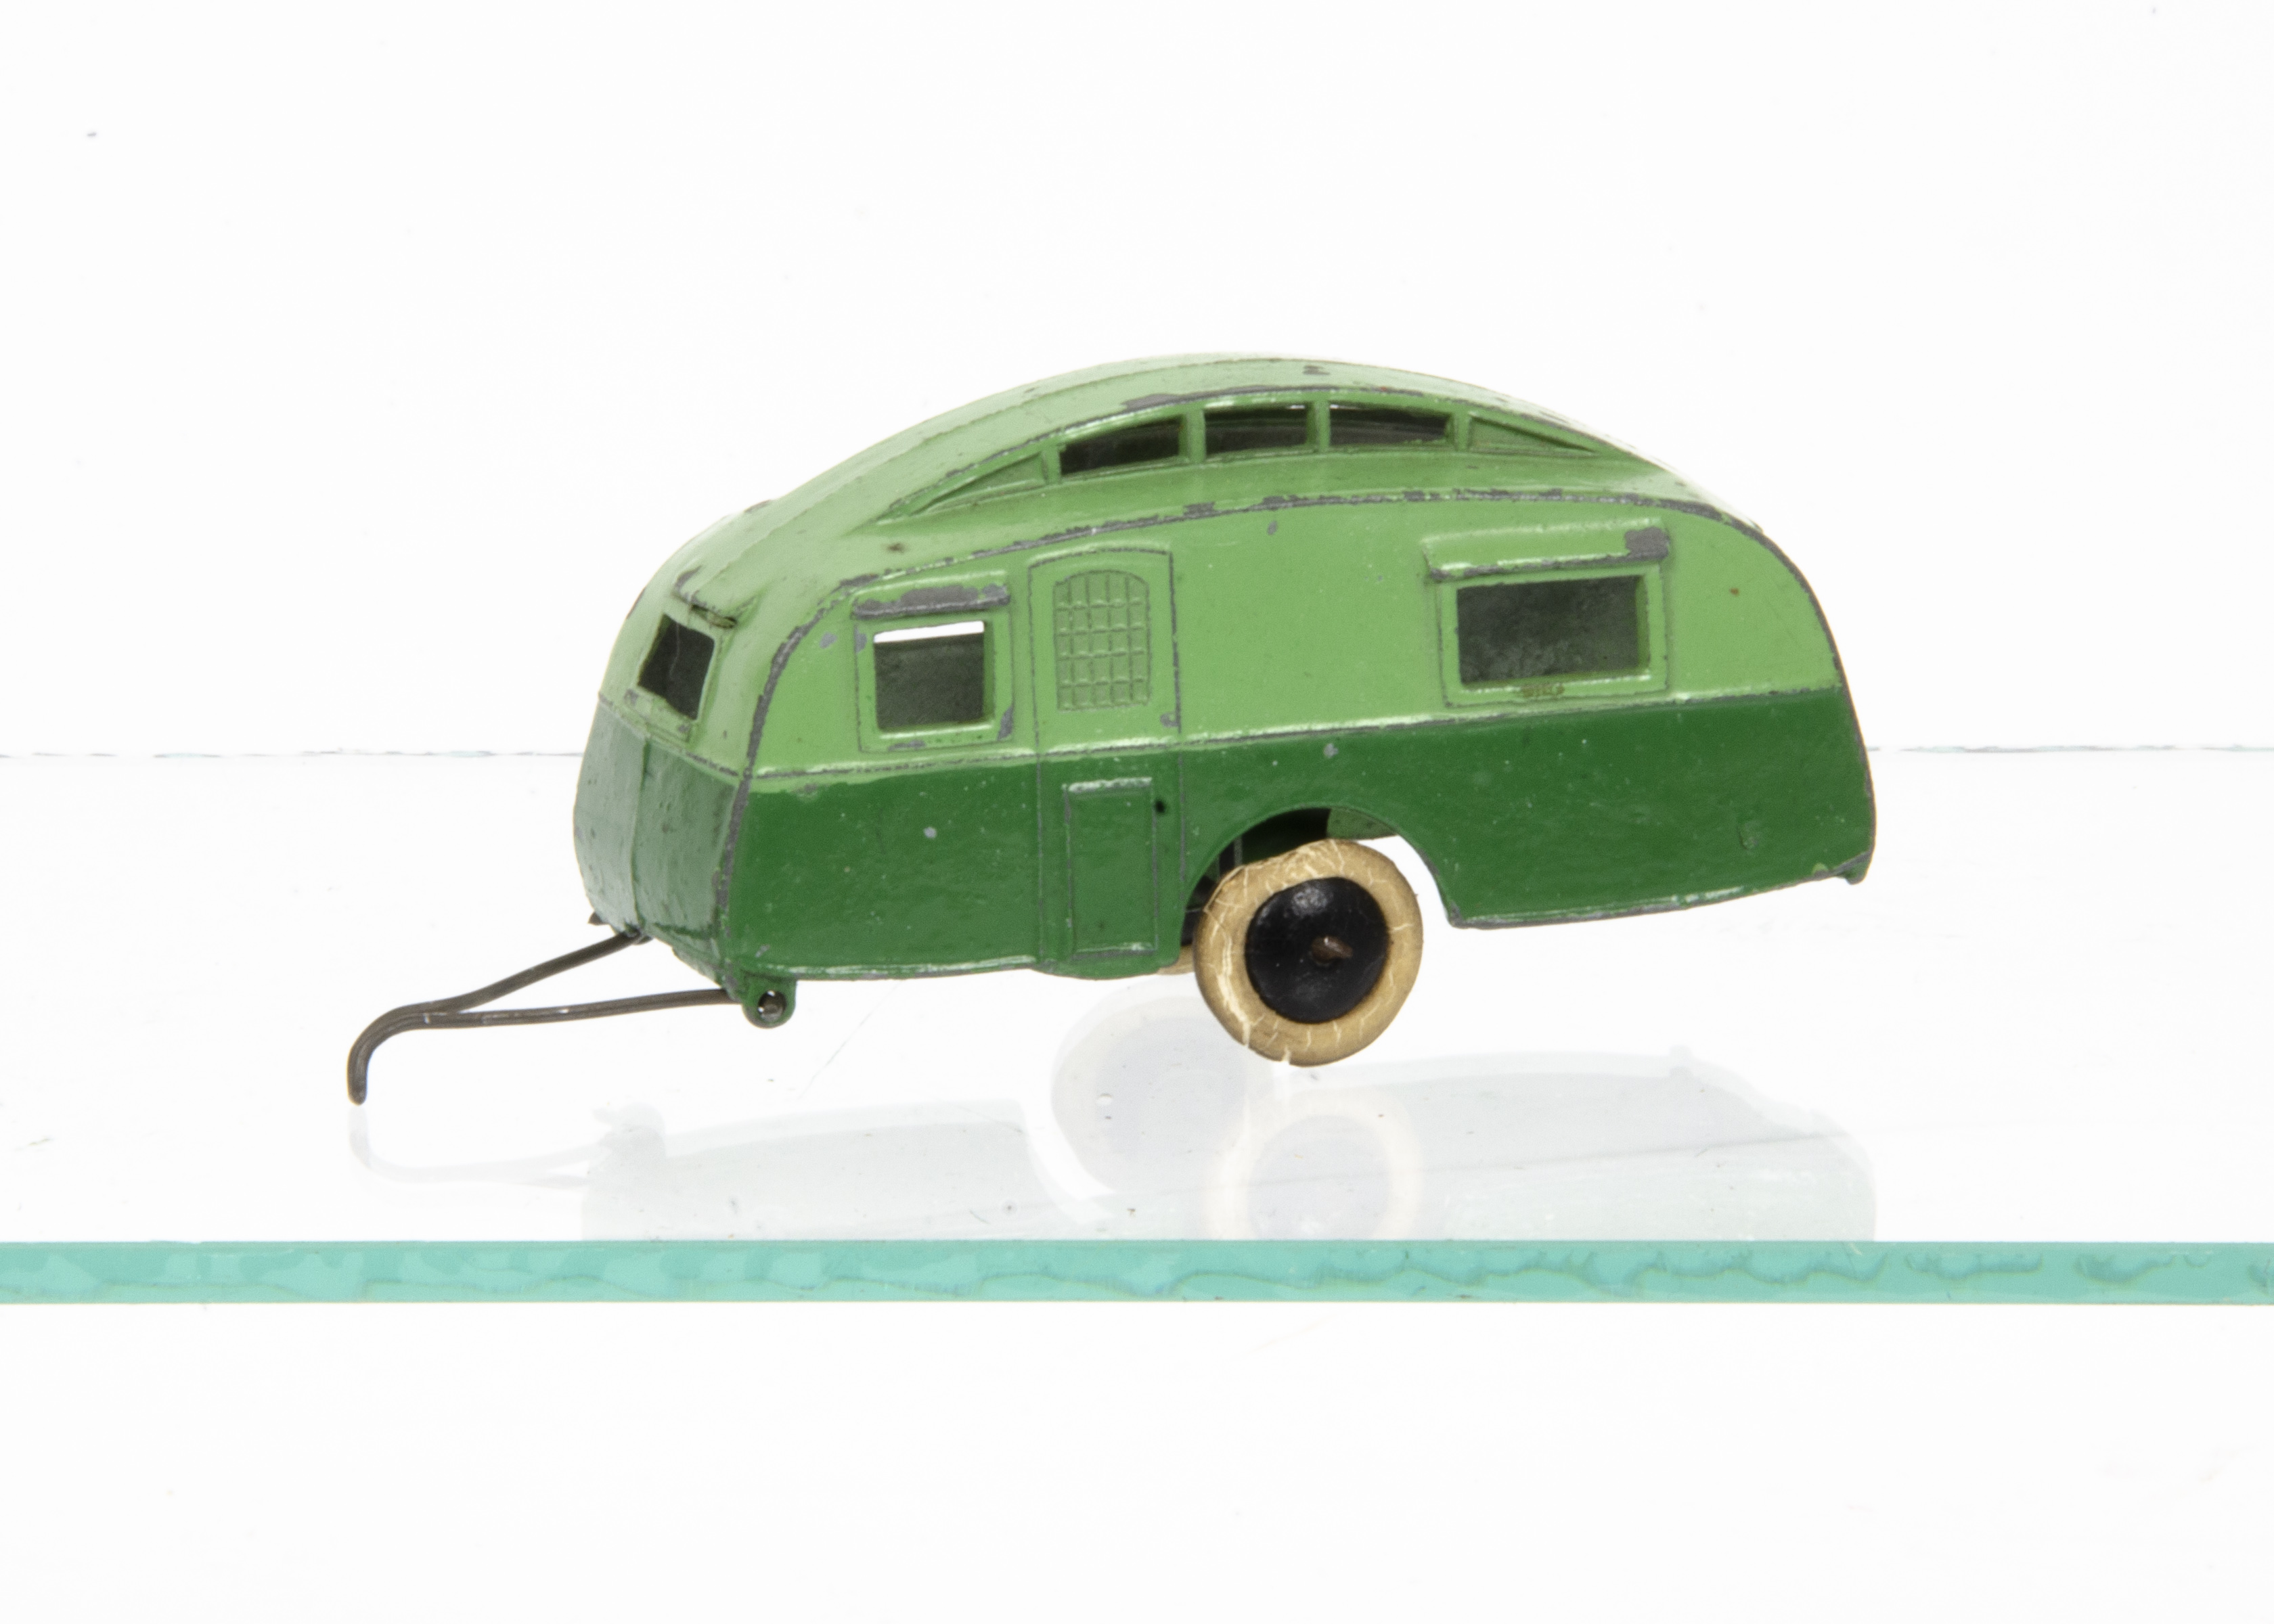 Lot 4 - A Pre-War Dinky Toys 30g Caravan, two-tone green body, black smooth hubs, wire drawbar, F, drawbar